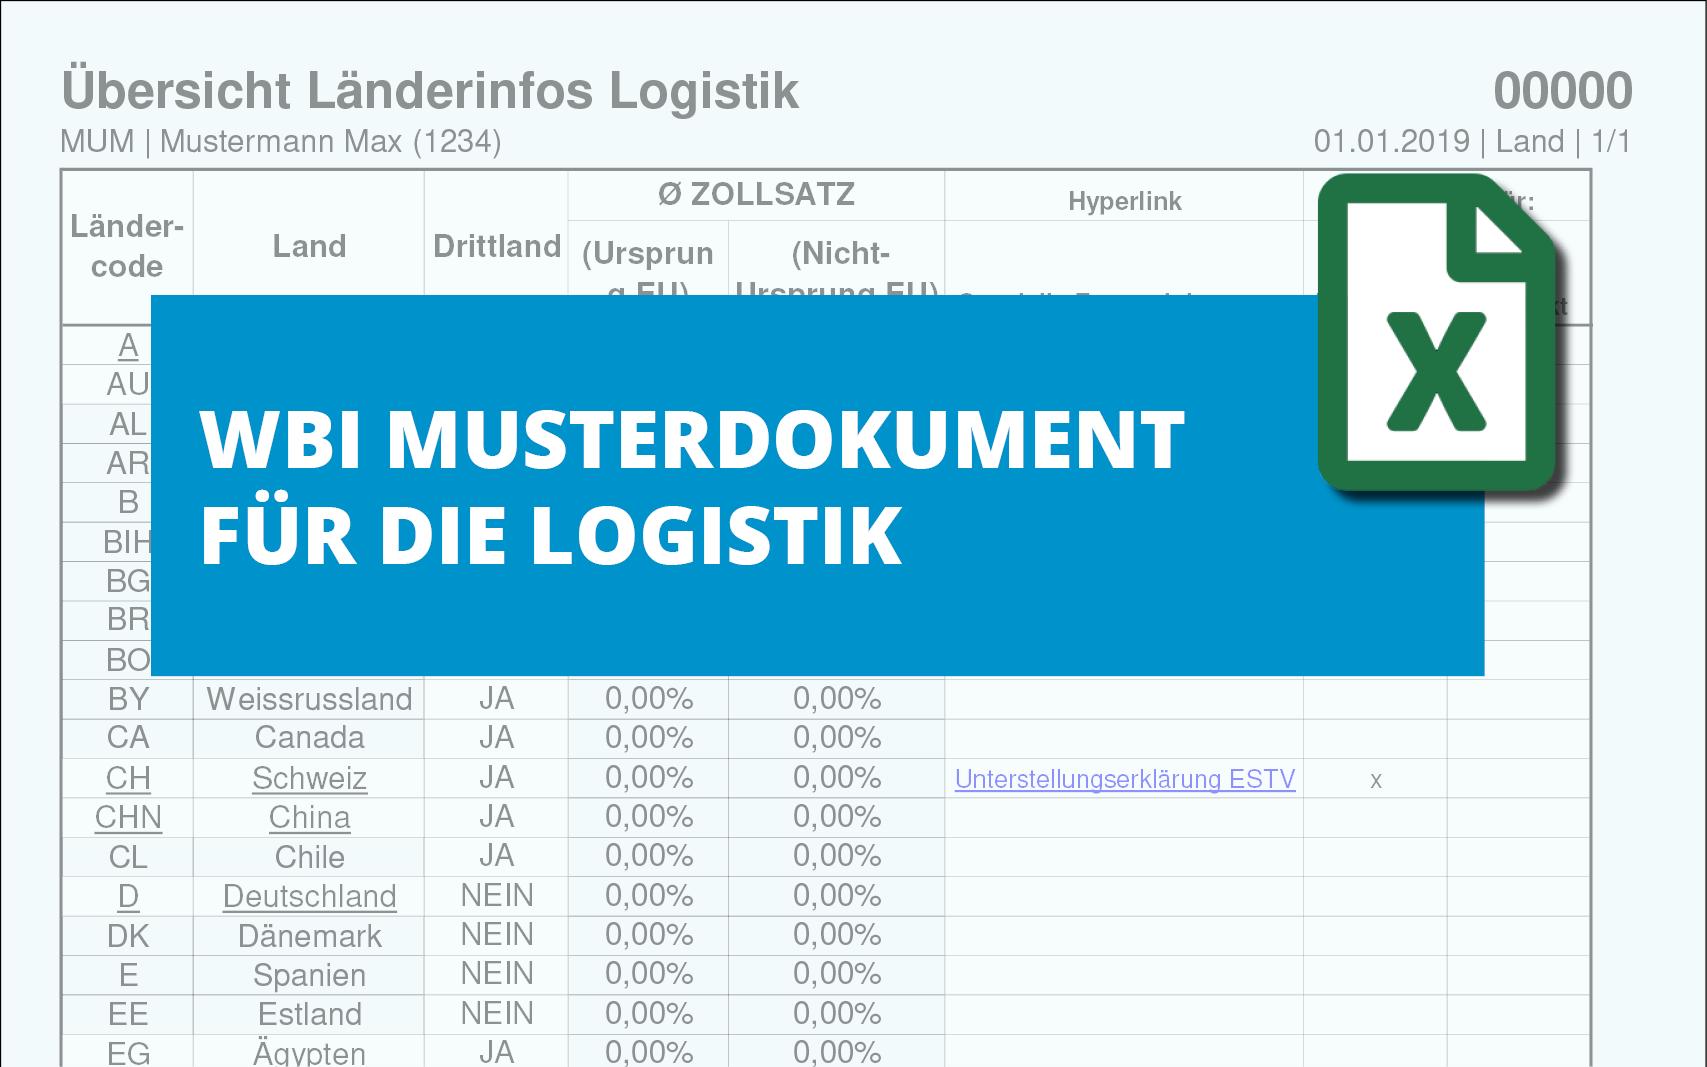 uebersicht-laenderinfos-logistik